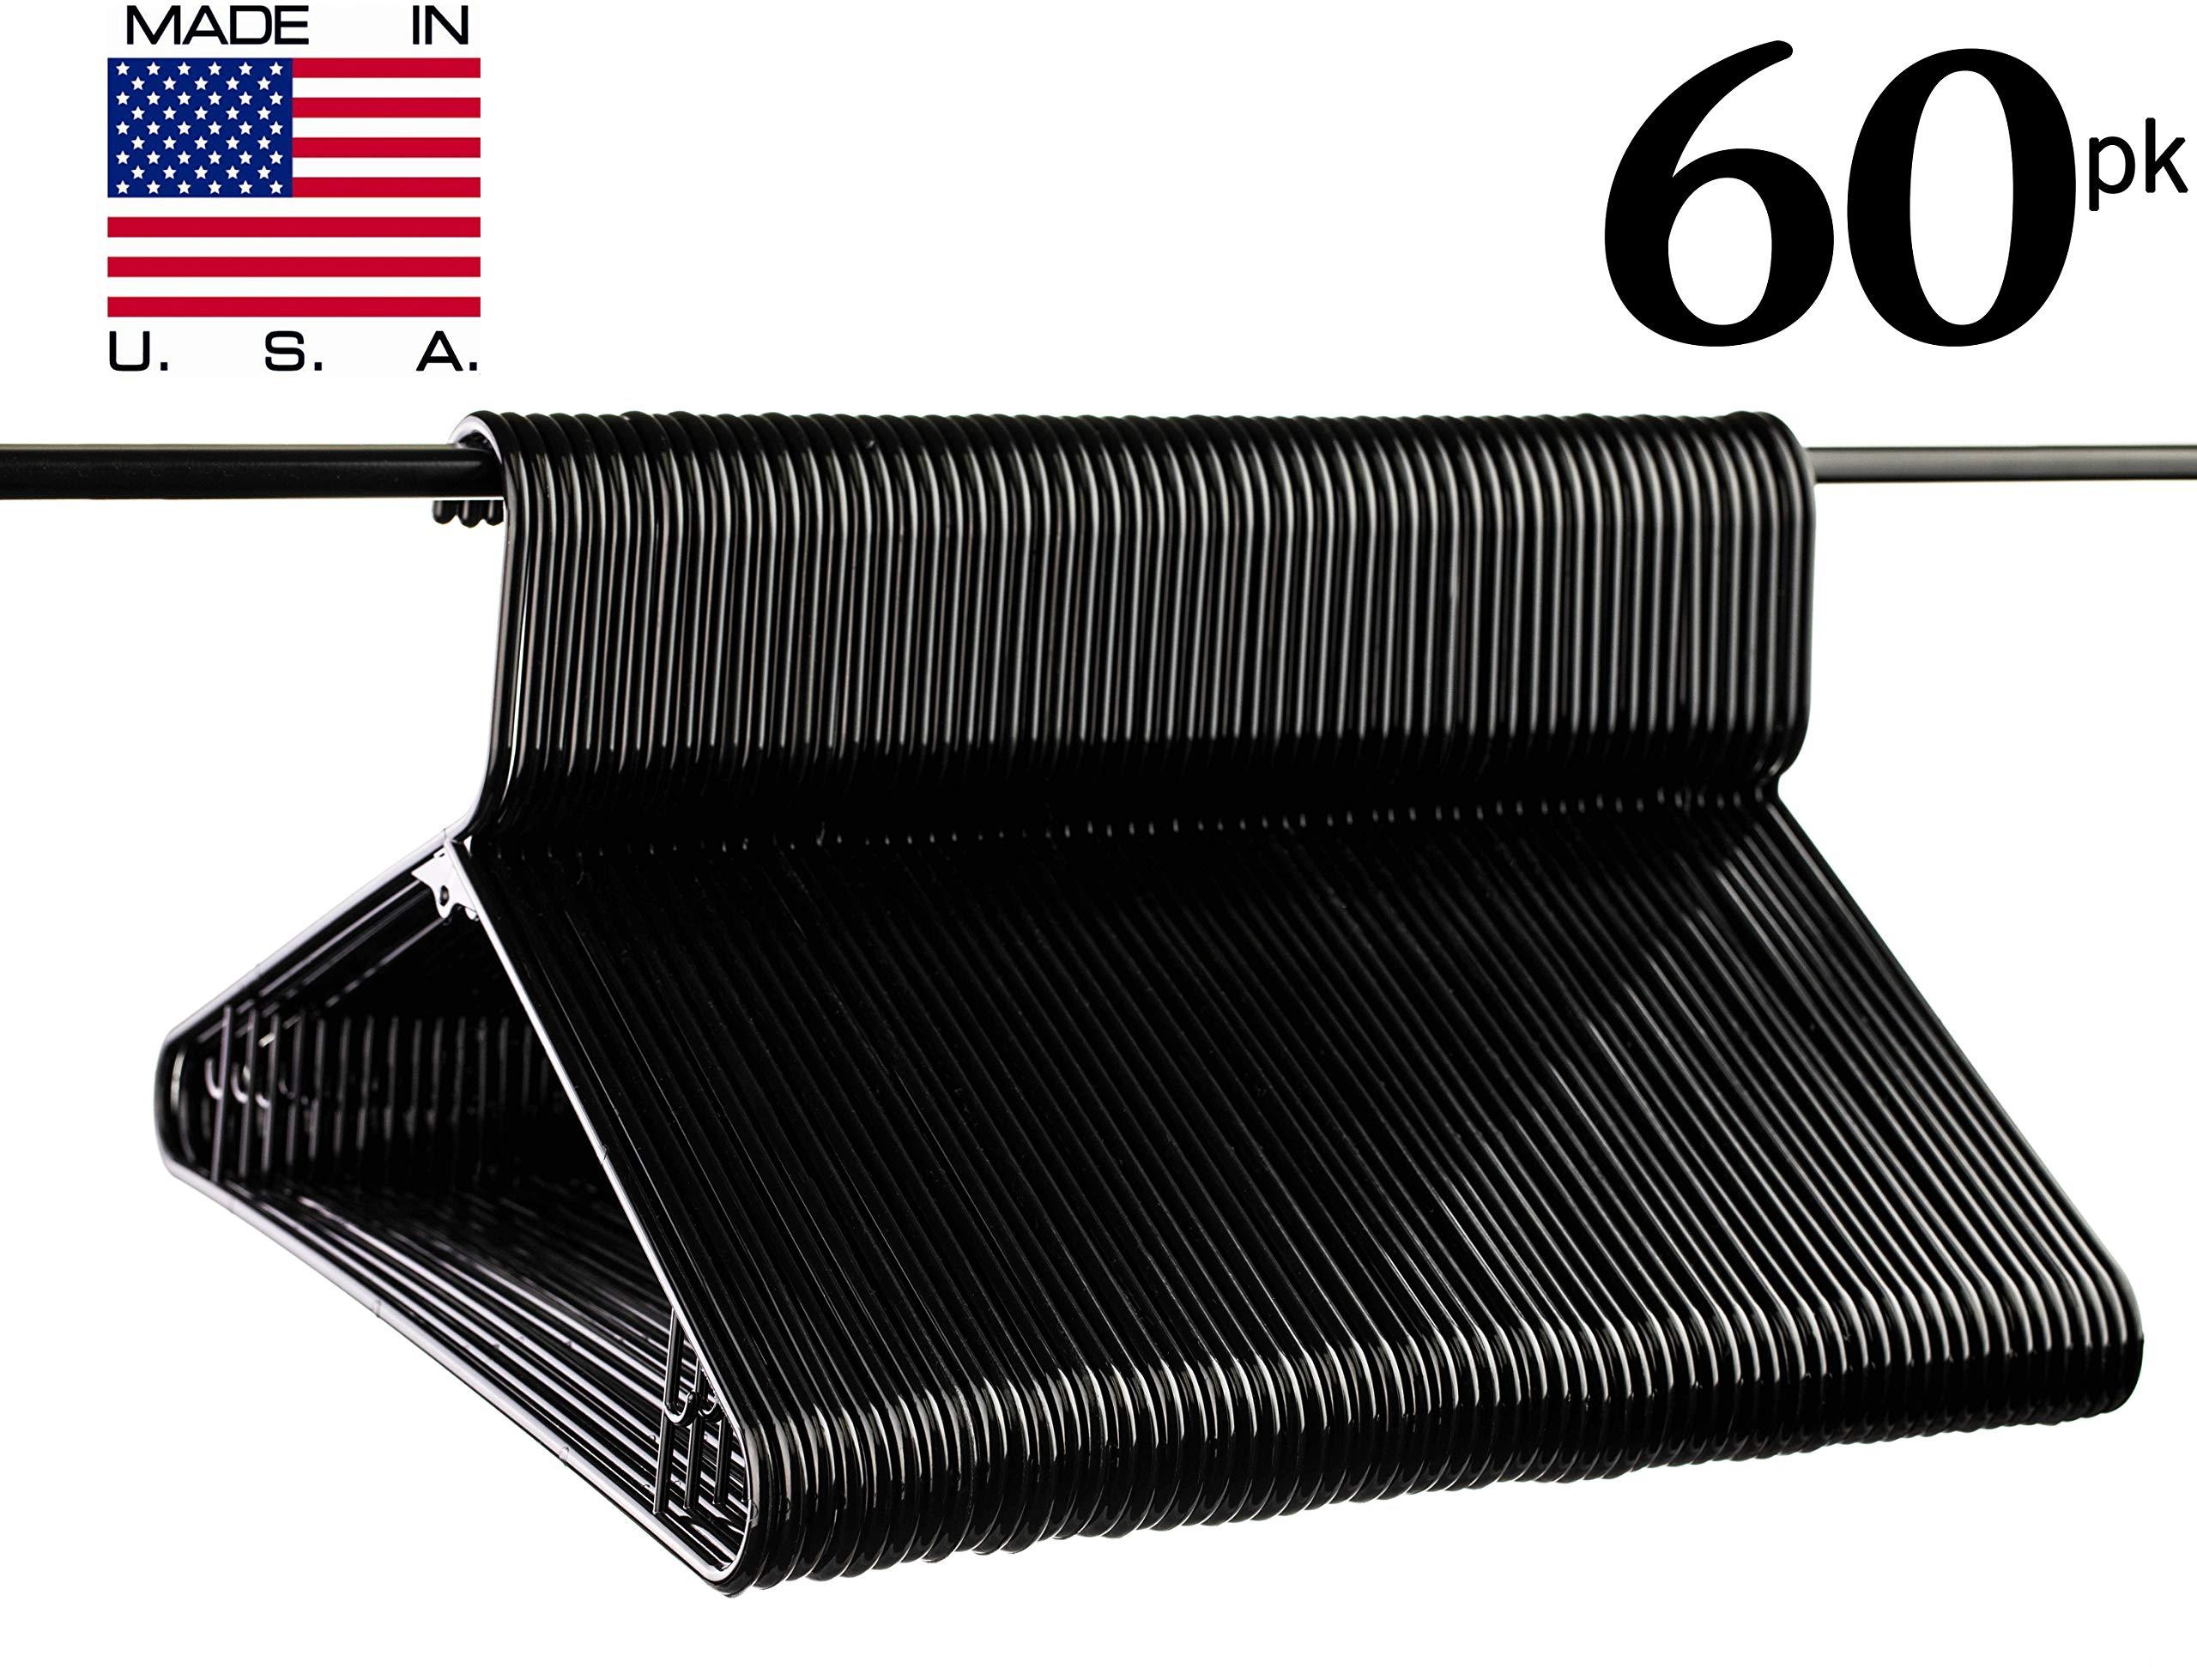 Neaties USA Made Black Plastic Hangers with Bar Hooks, 60pk